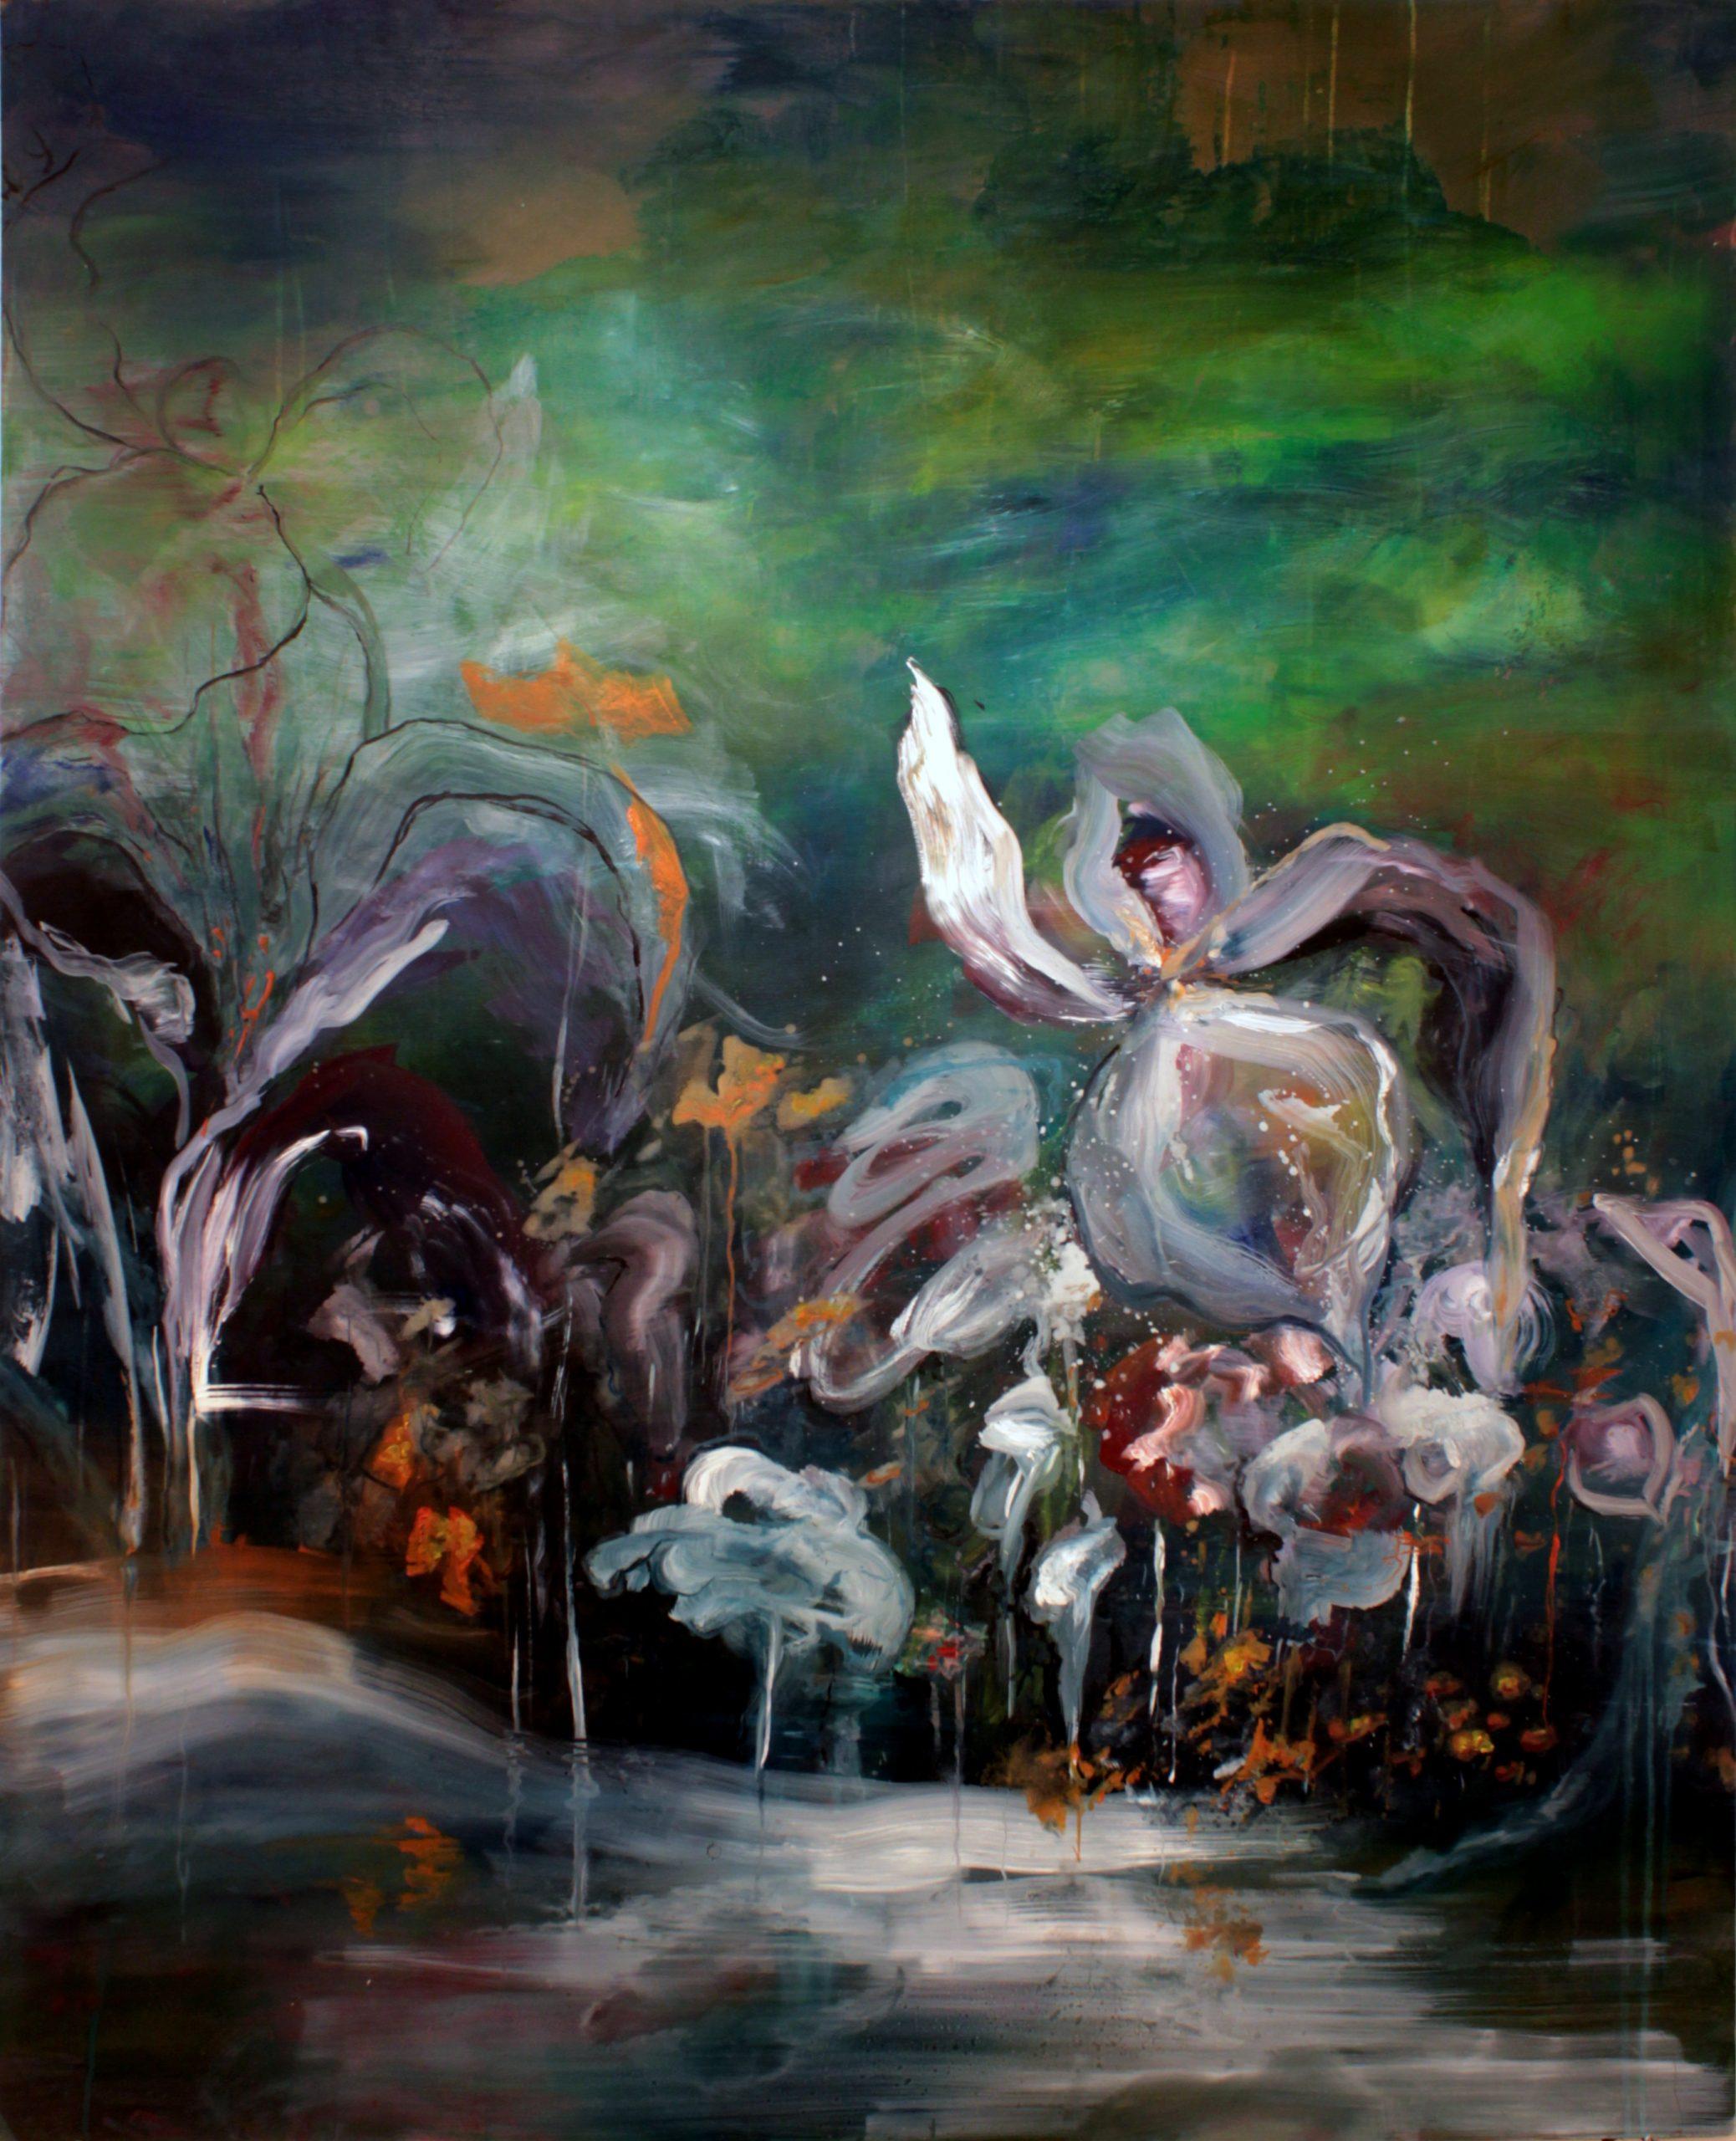 """Not out of the woods yet"", 122x152cm, öljy mdf.levylle, 2016 (yksityisomistuksessa)"